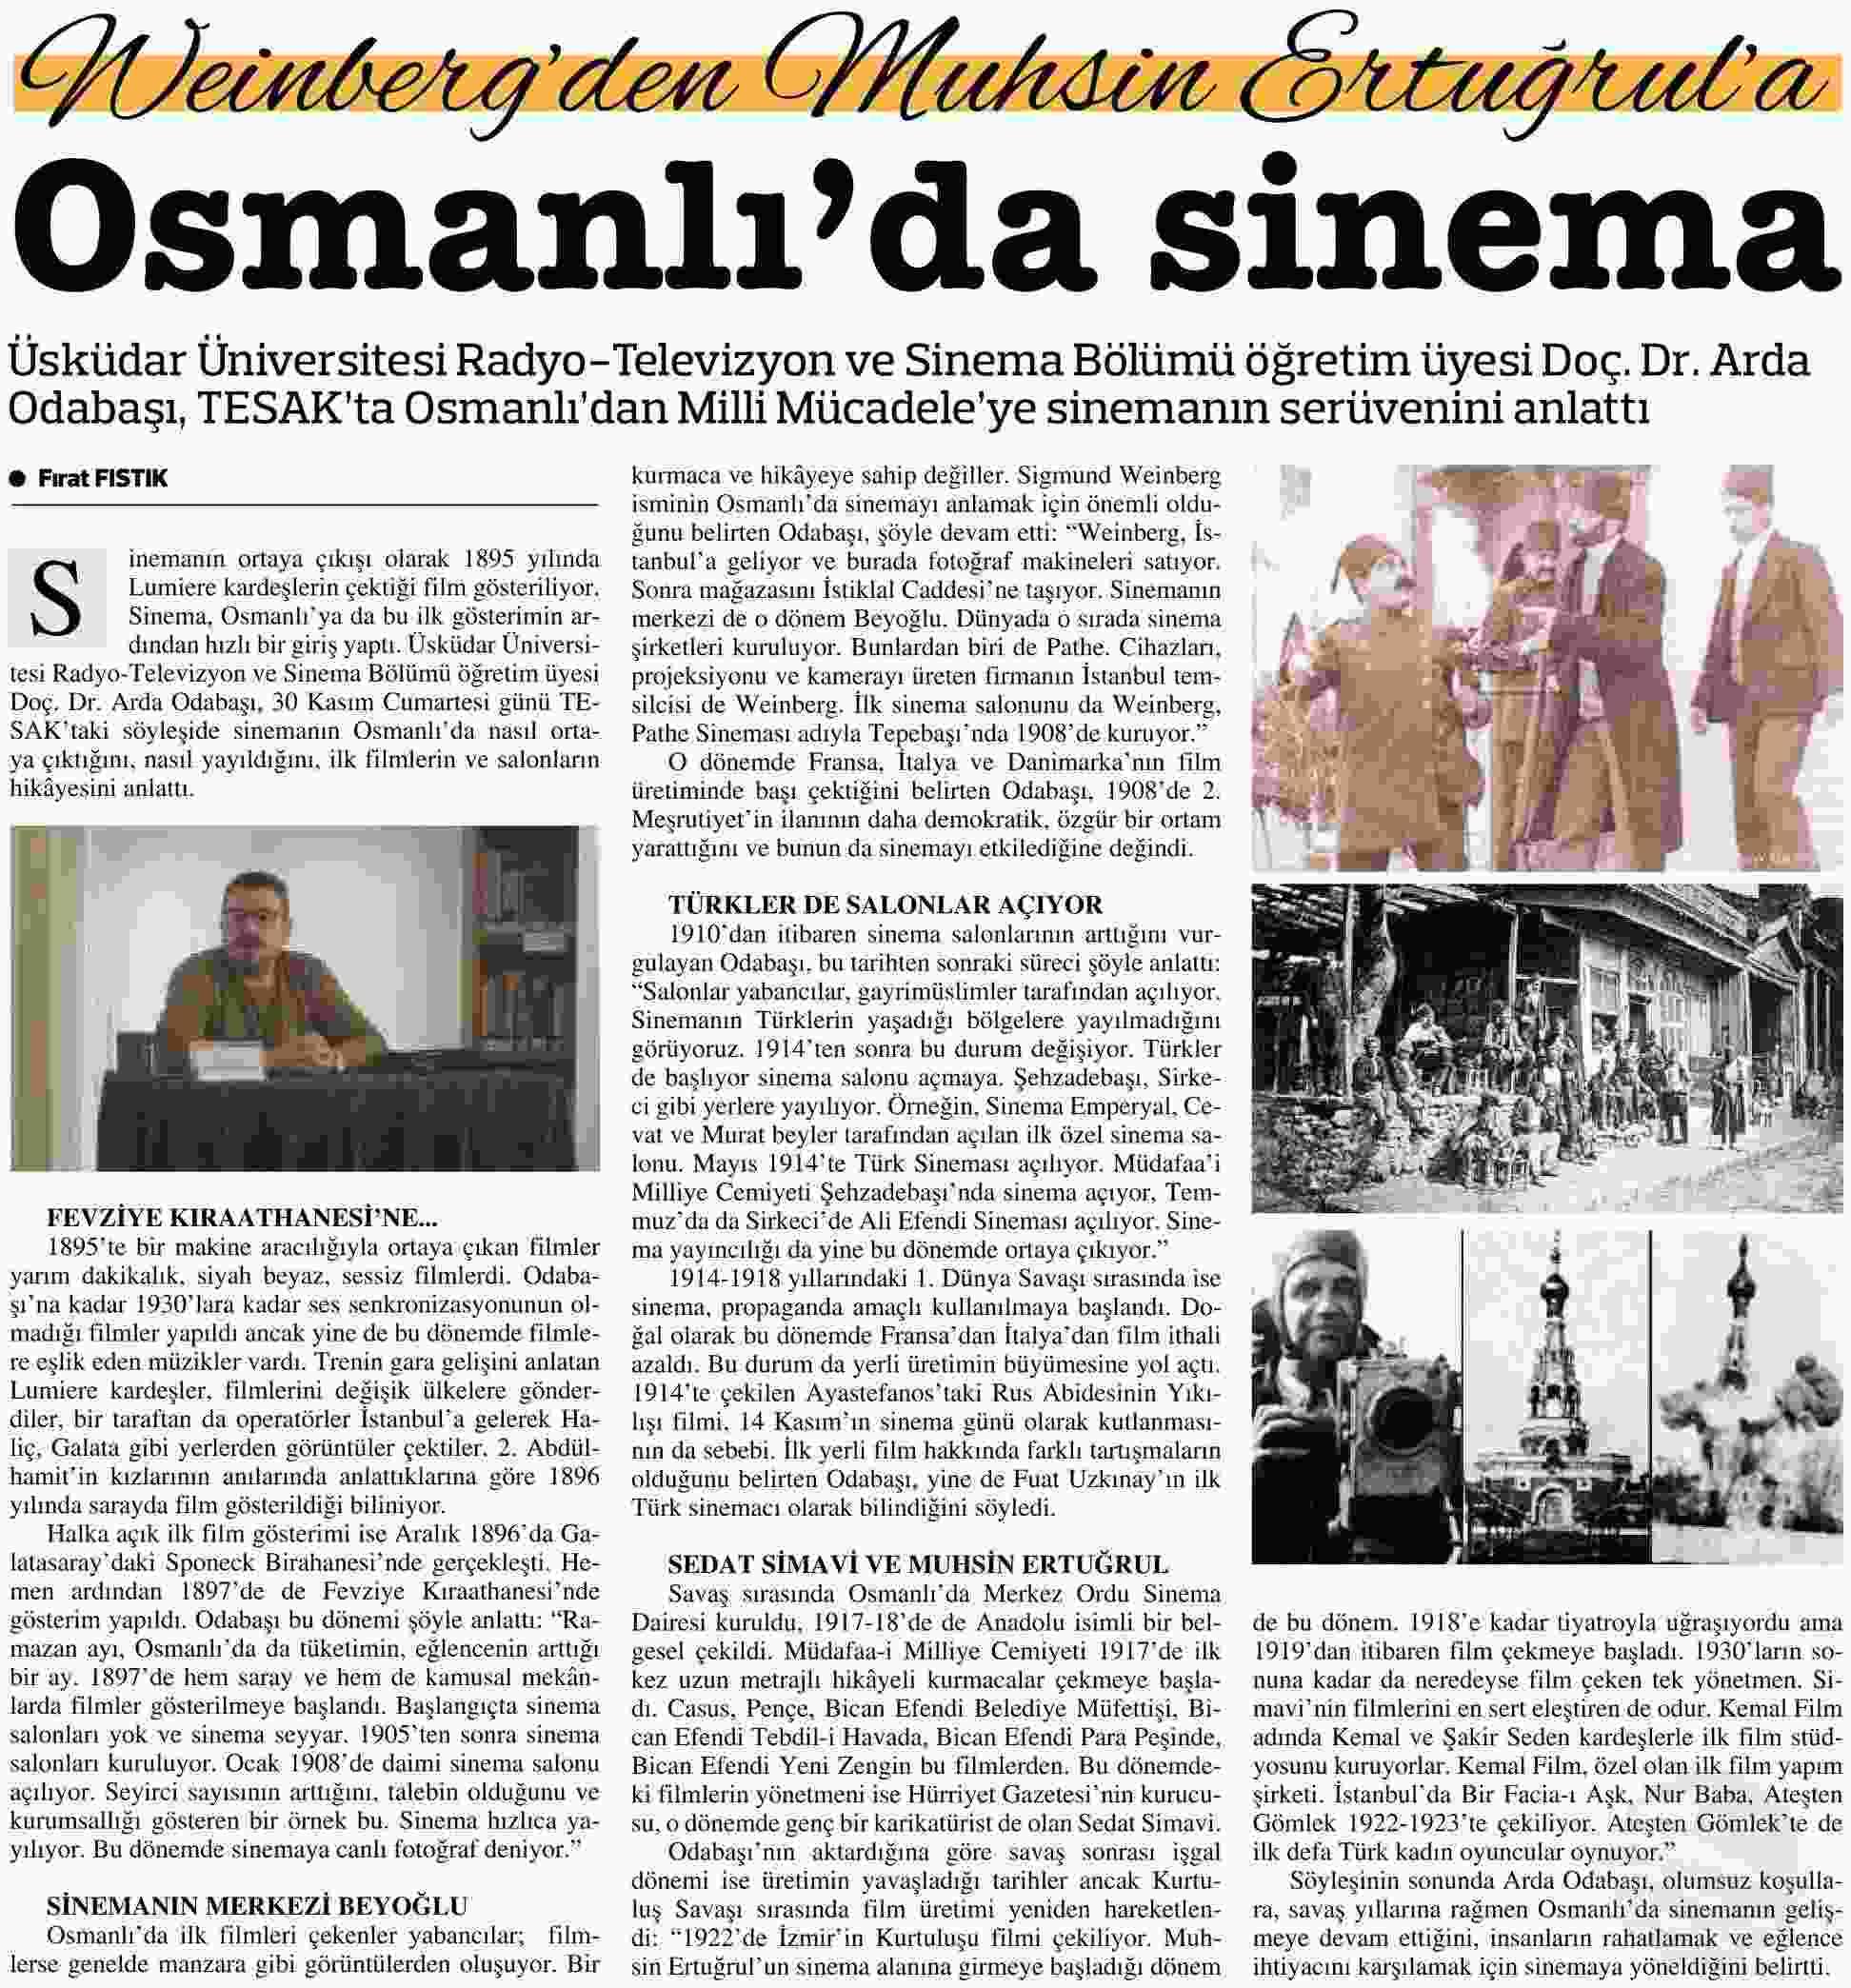 OSMANLIDA SİNEMA